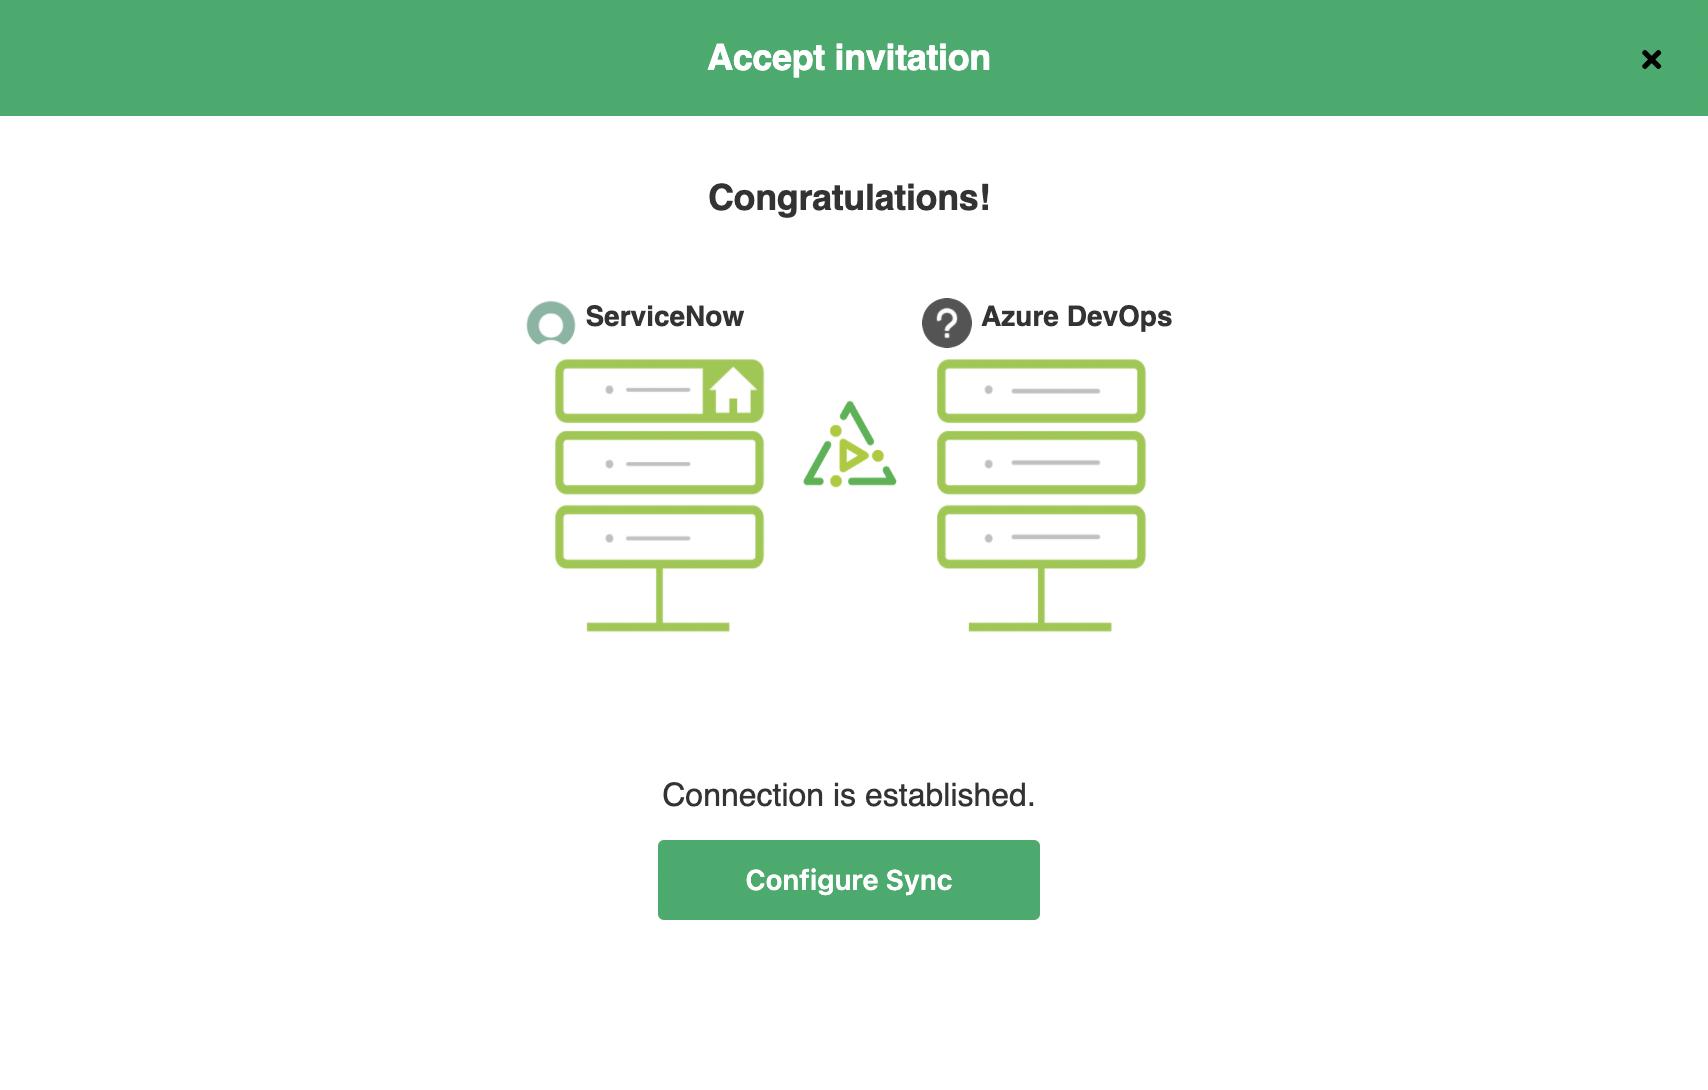 Integration between Azure DevOps and ServiceNow